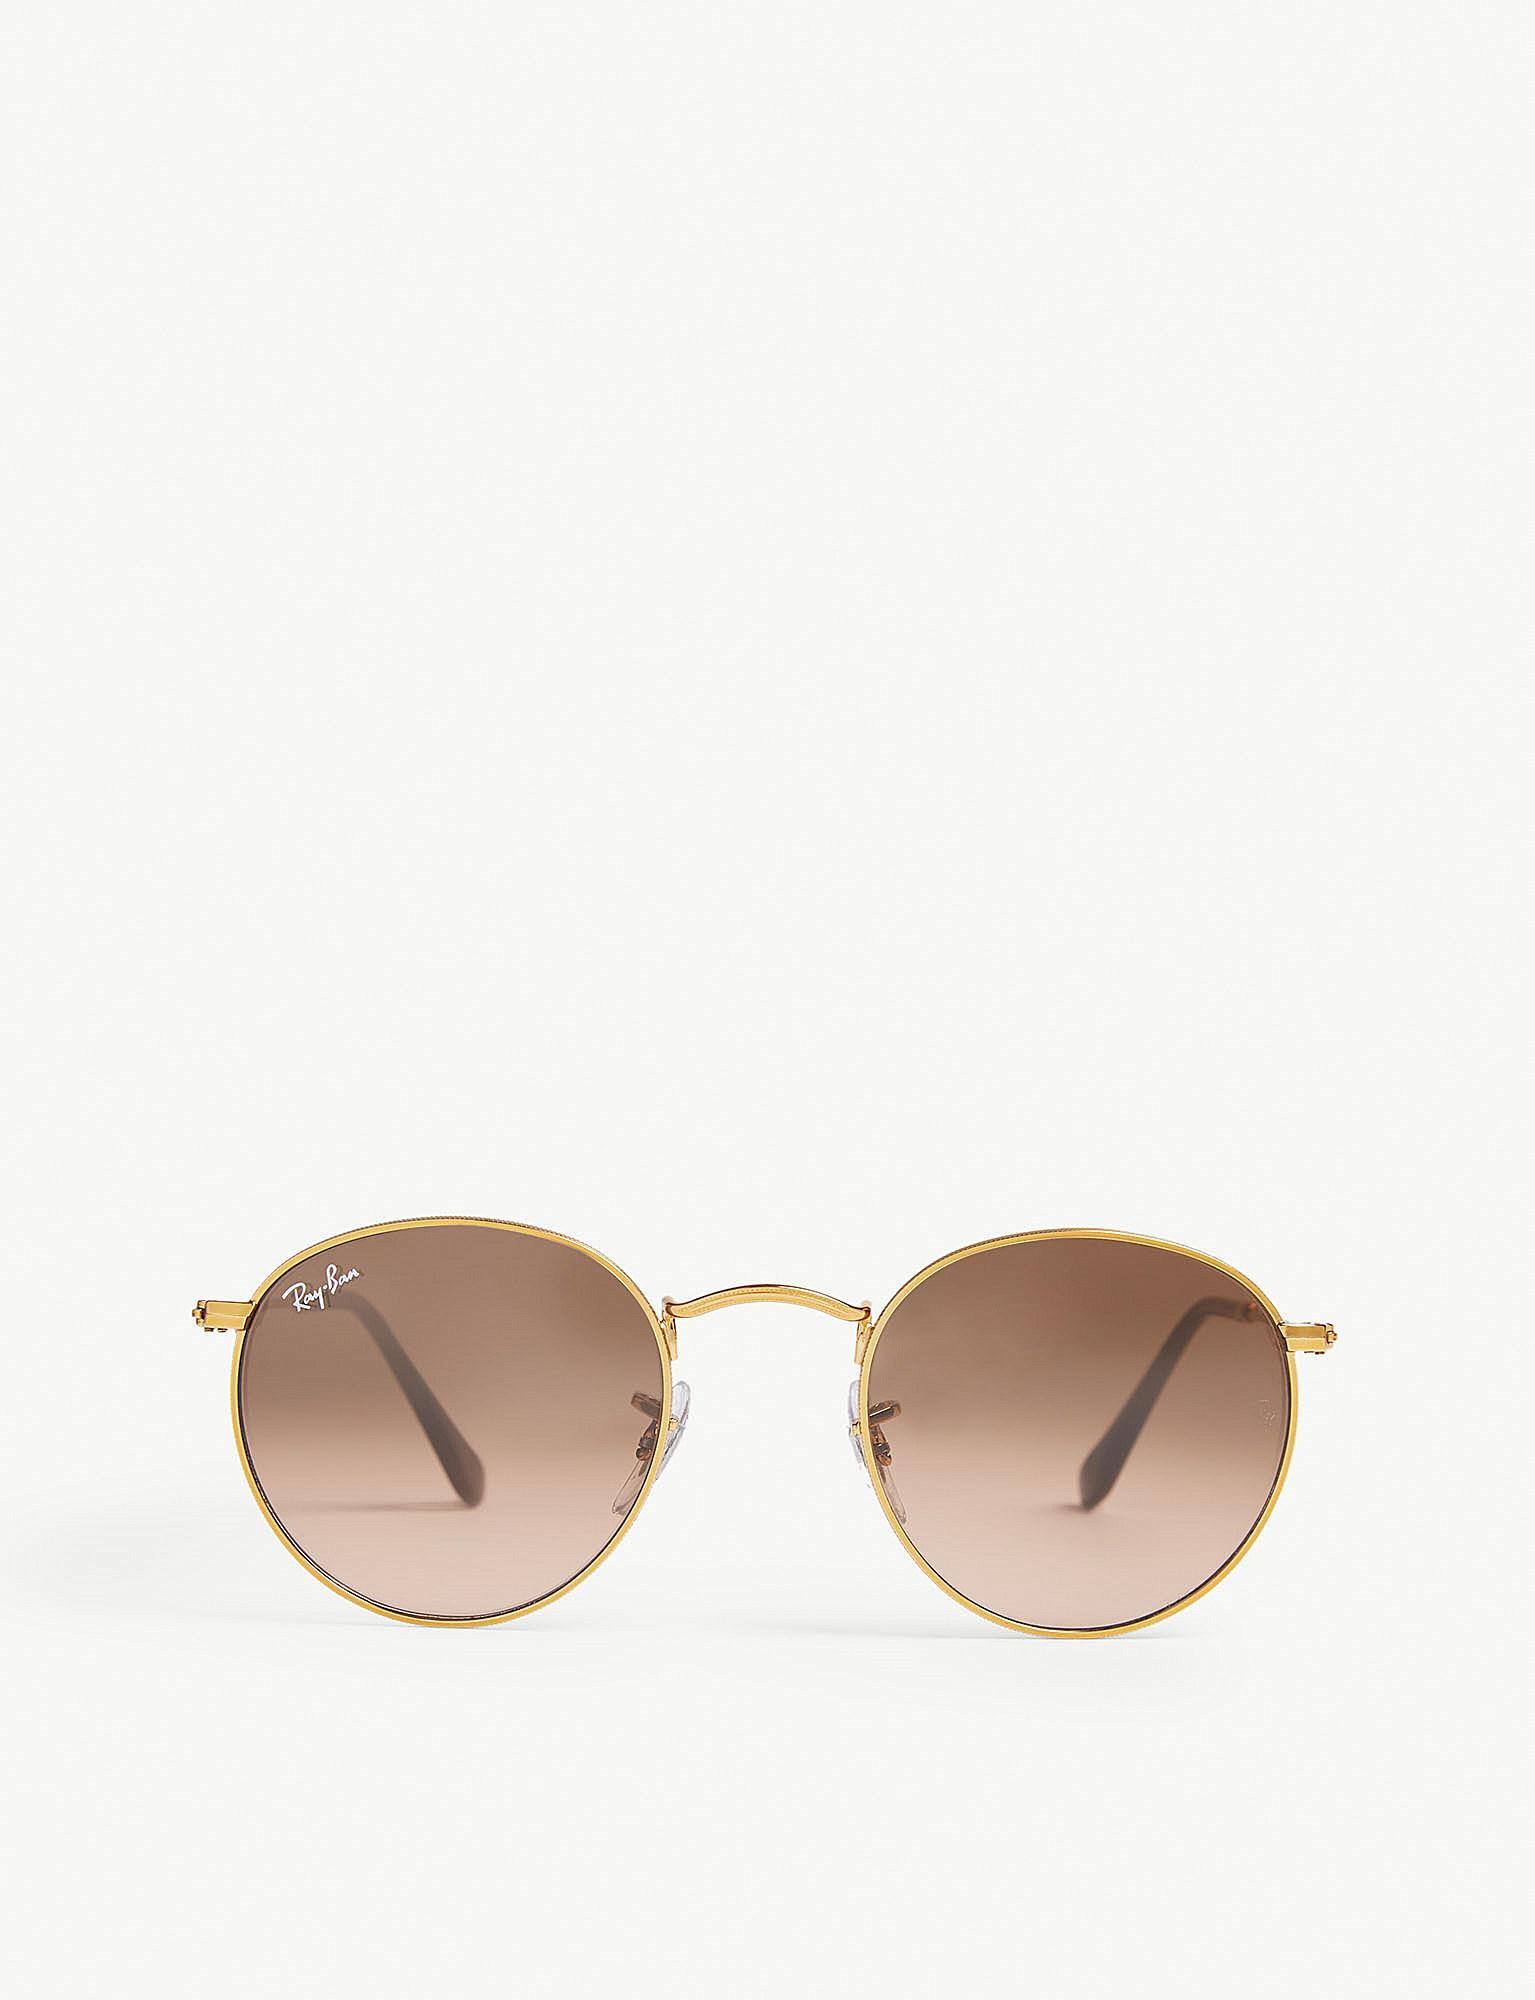 a80874542b Ray-Ban Rb3447 Phantos-frame Sunglasses in Metallic - Lyst